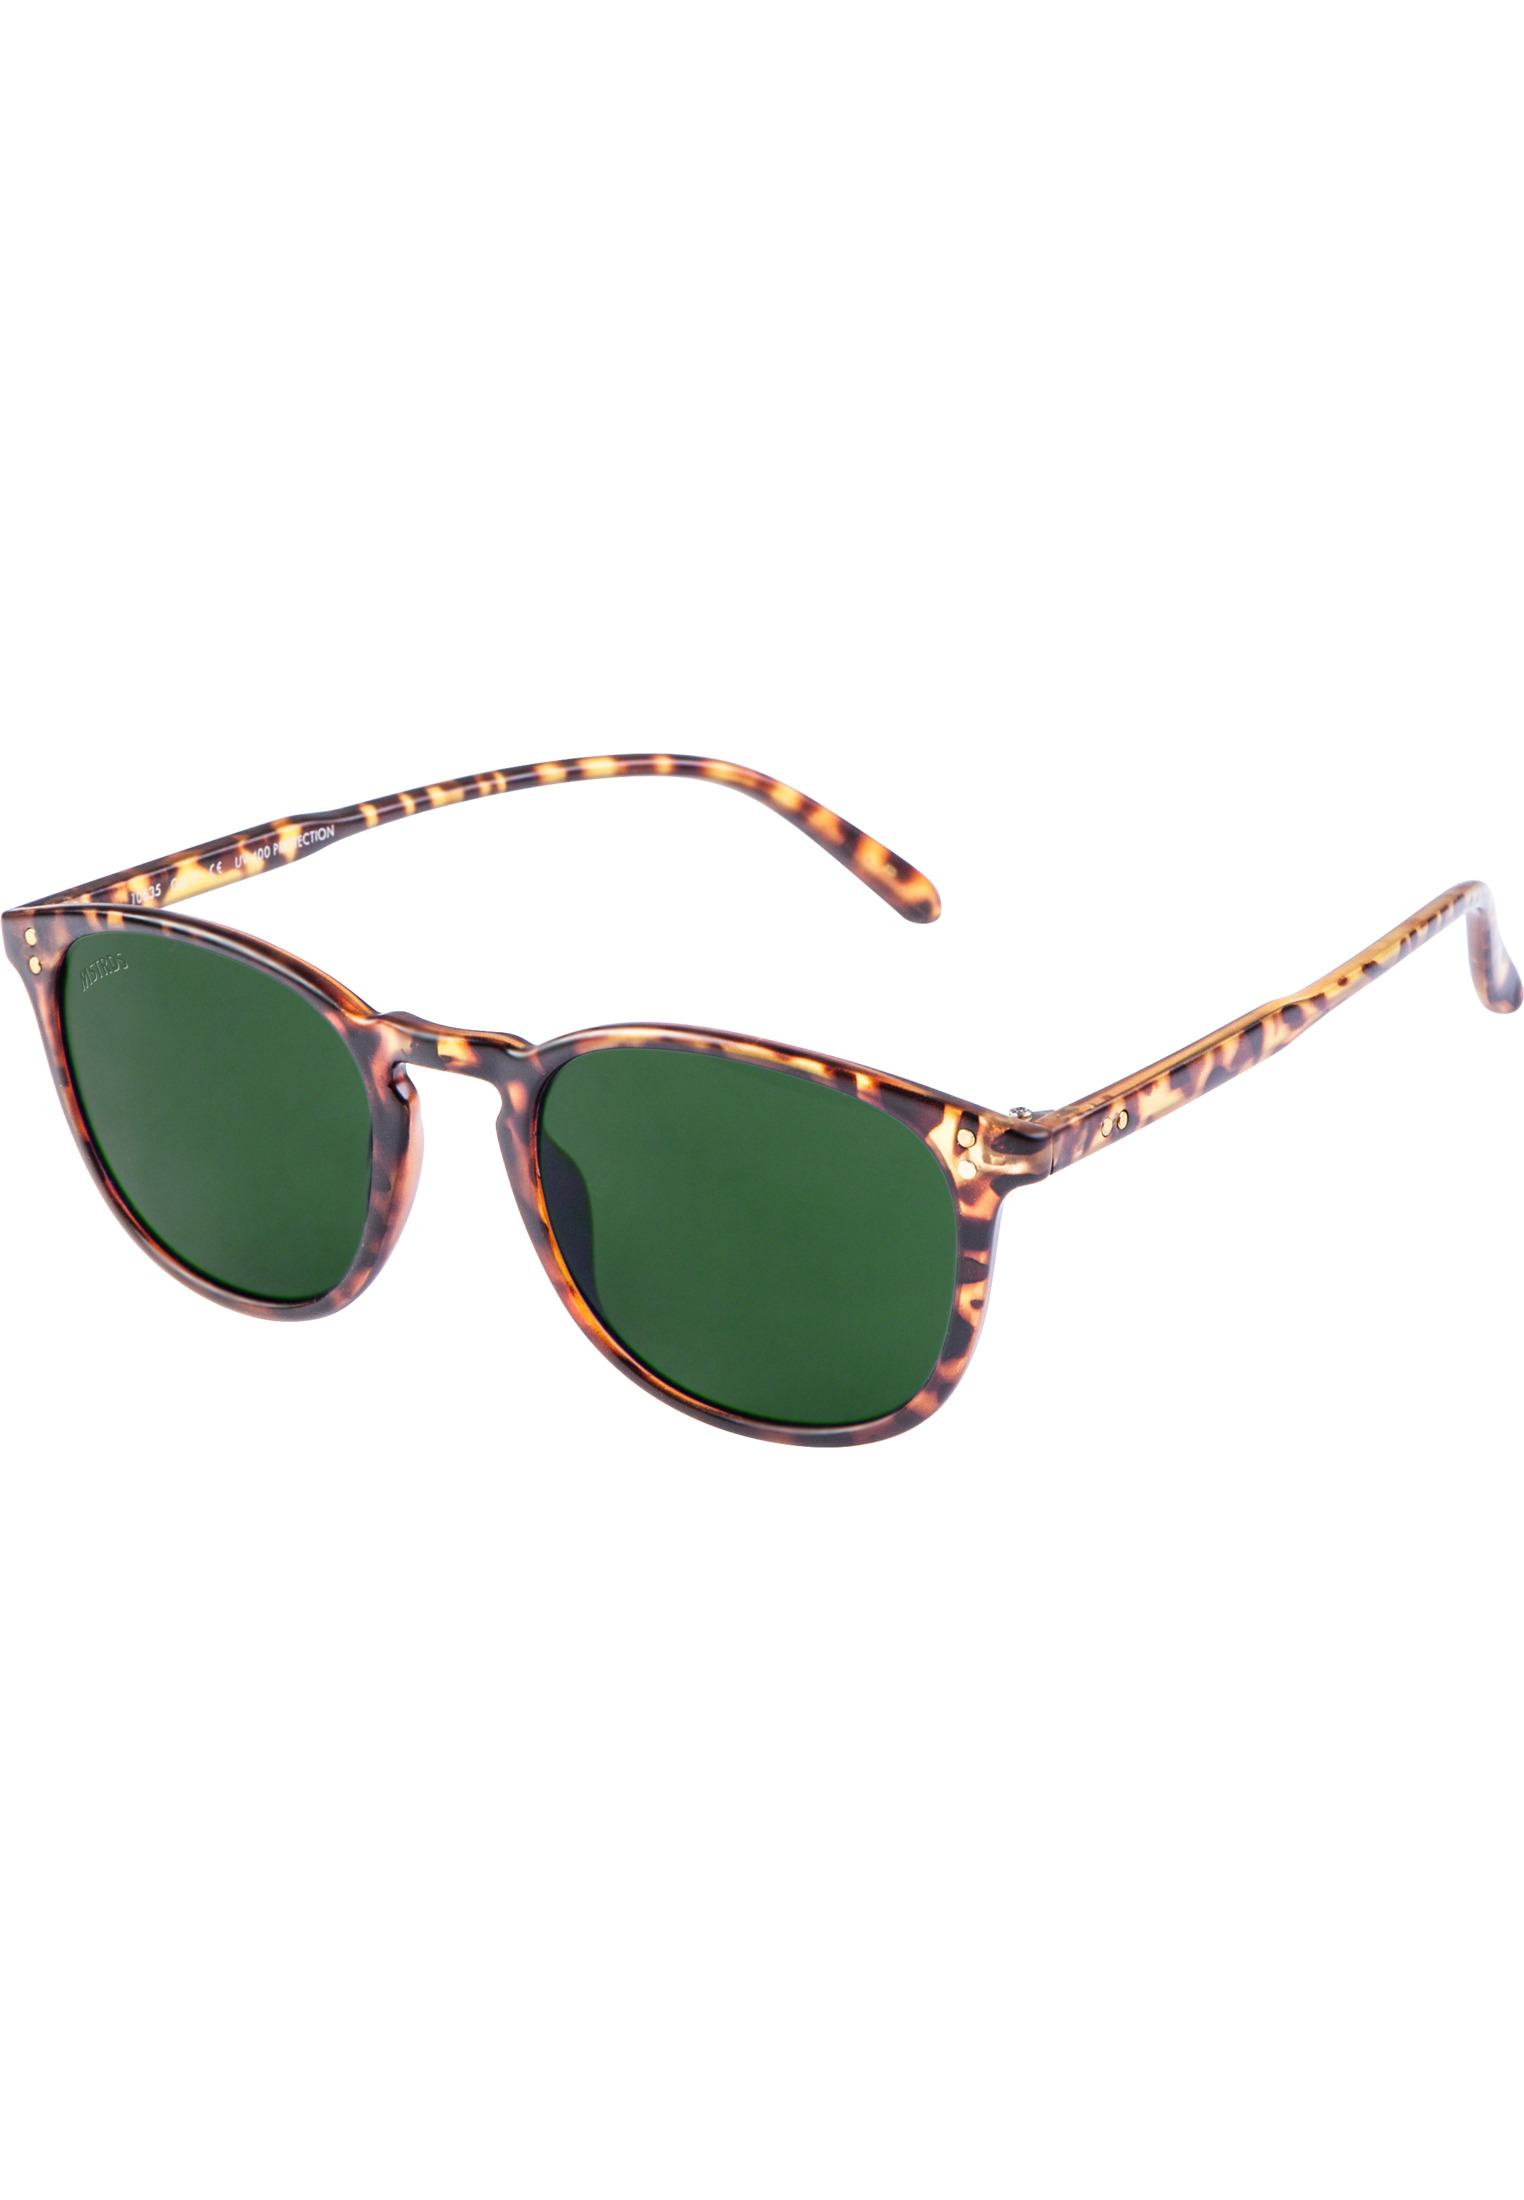 Master Dis Sunglasses Arthur havanna/green - One Size